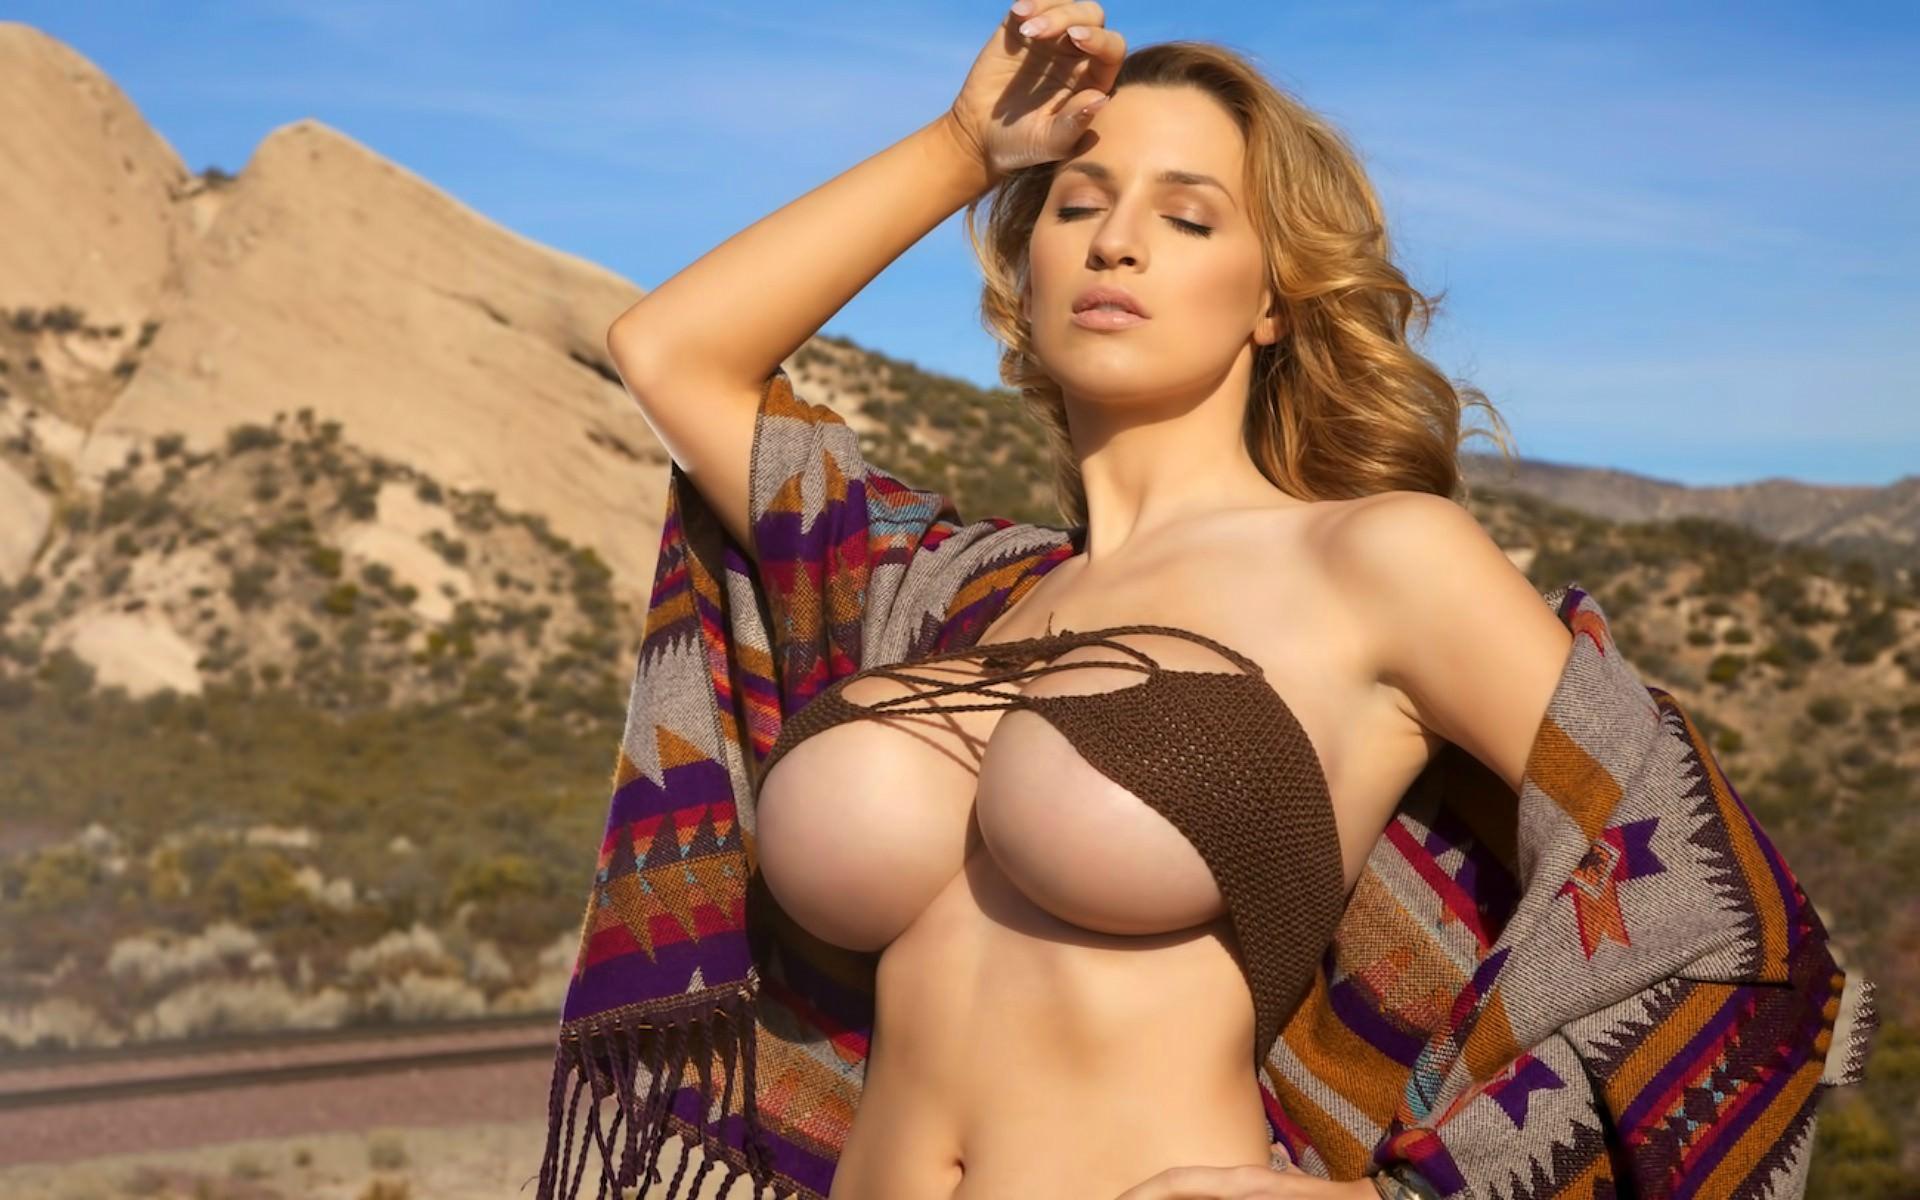 Amature epic boobs